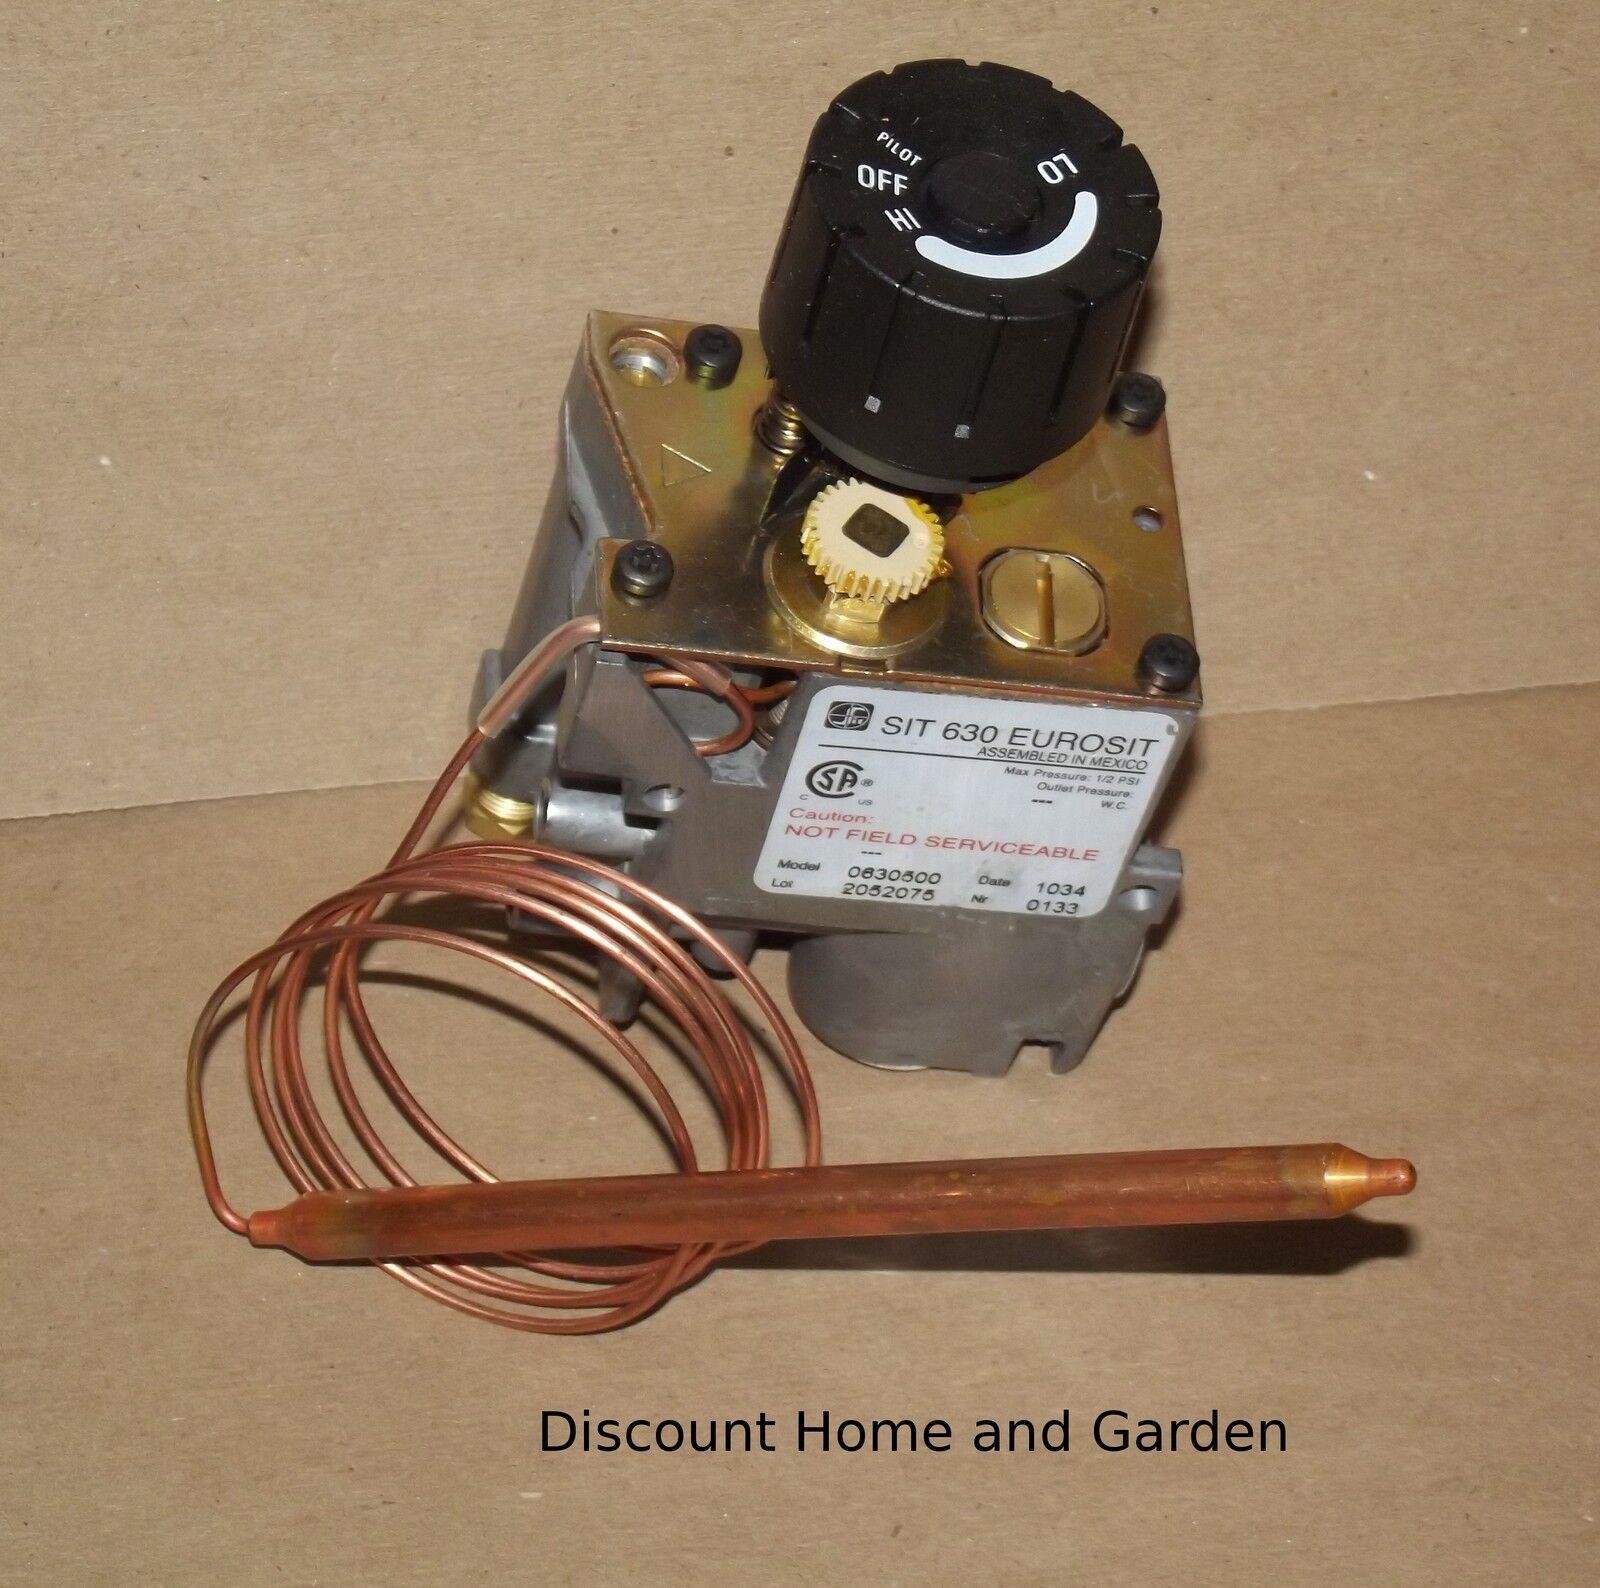 heater fireplace natural u0026 propane gas valve 630 eurosit 0630500